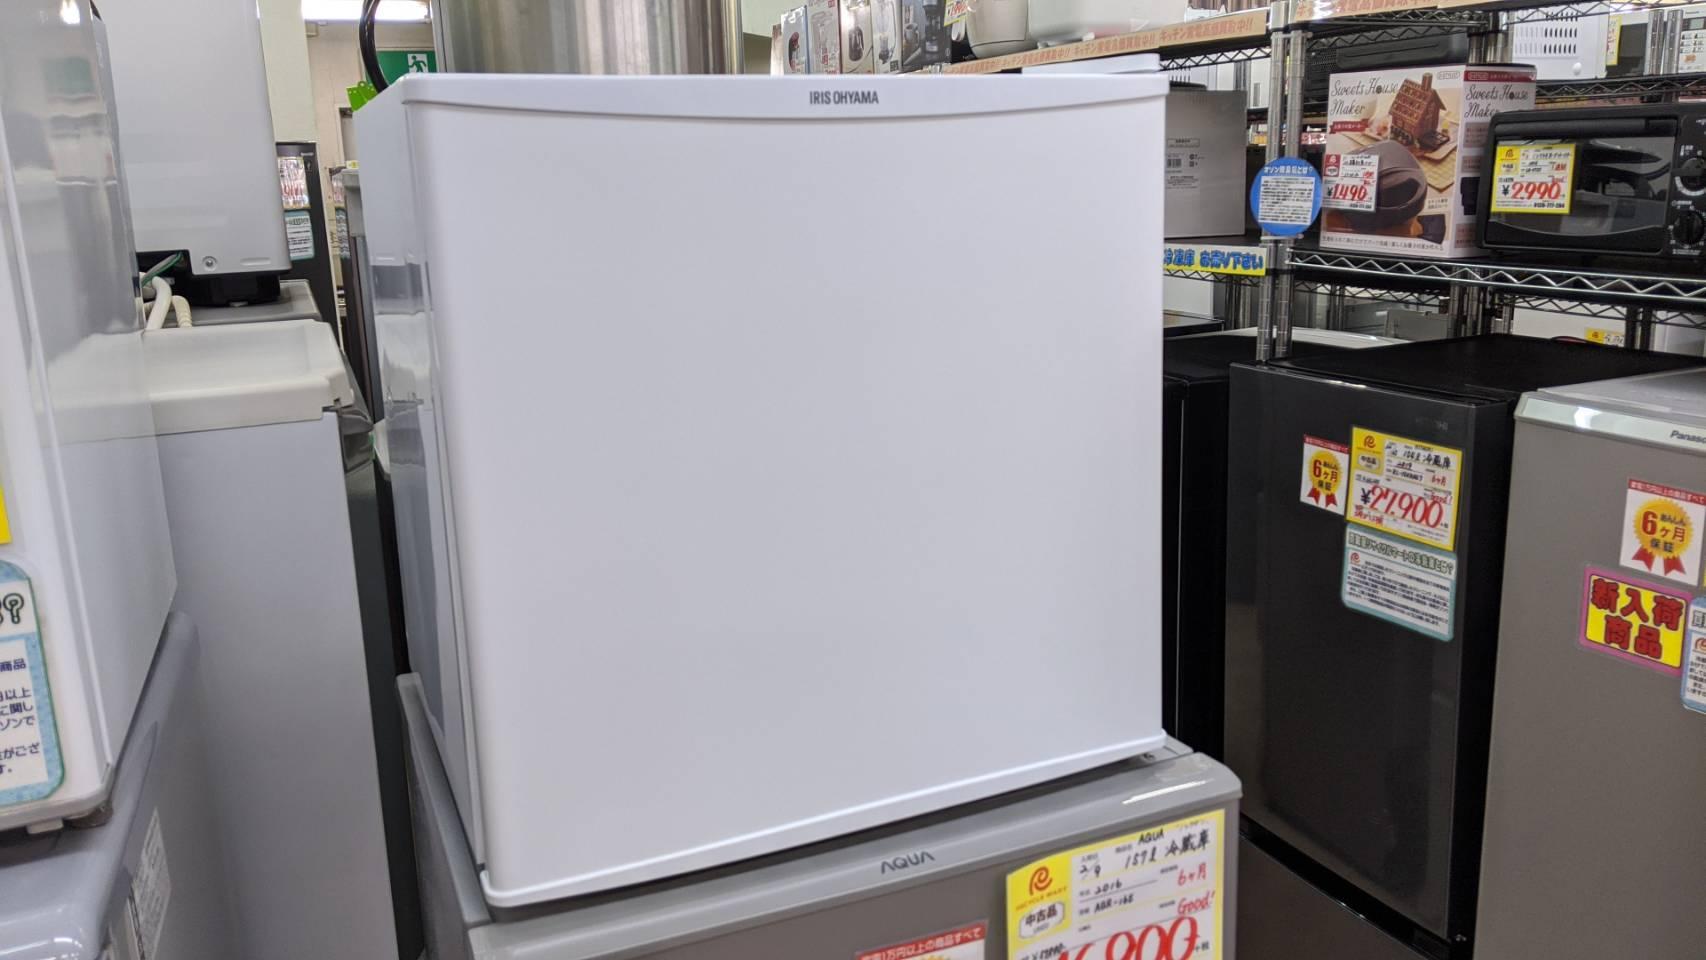 【IRIS OHYAMA 45L 冷蔵庫 2019年製 IRR-A051D-W 製氷室付 コンパクトサイズ】を買取させて頂きました!の買取-